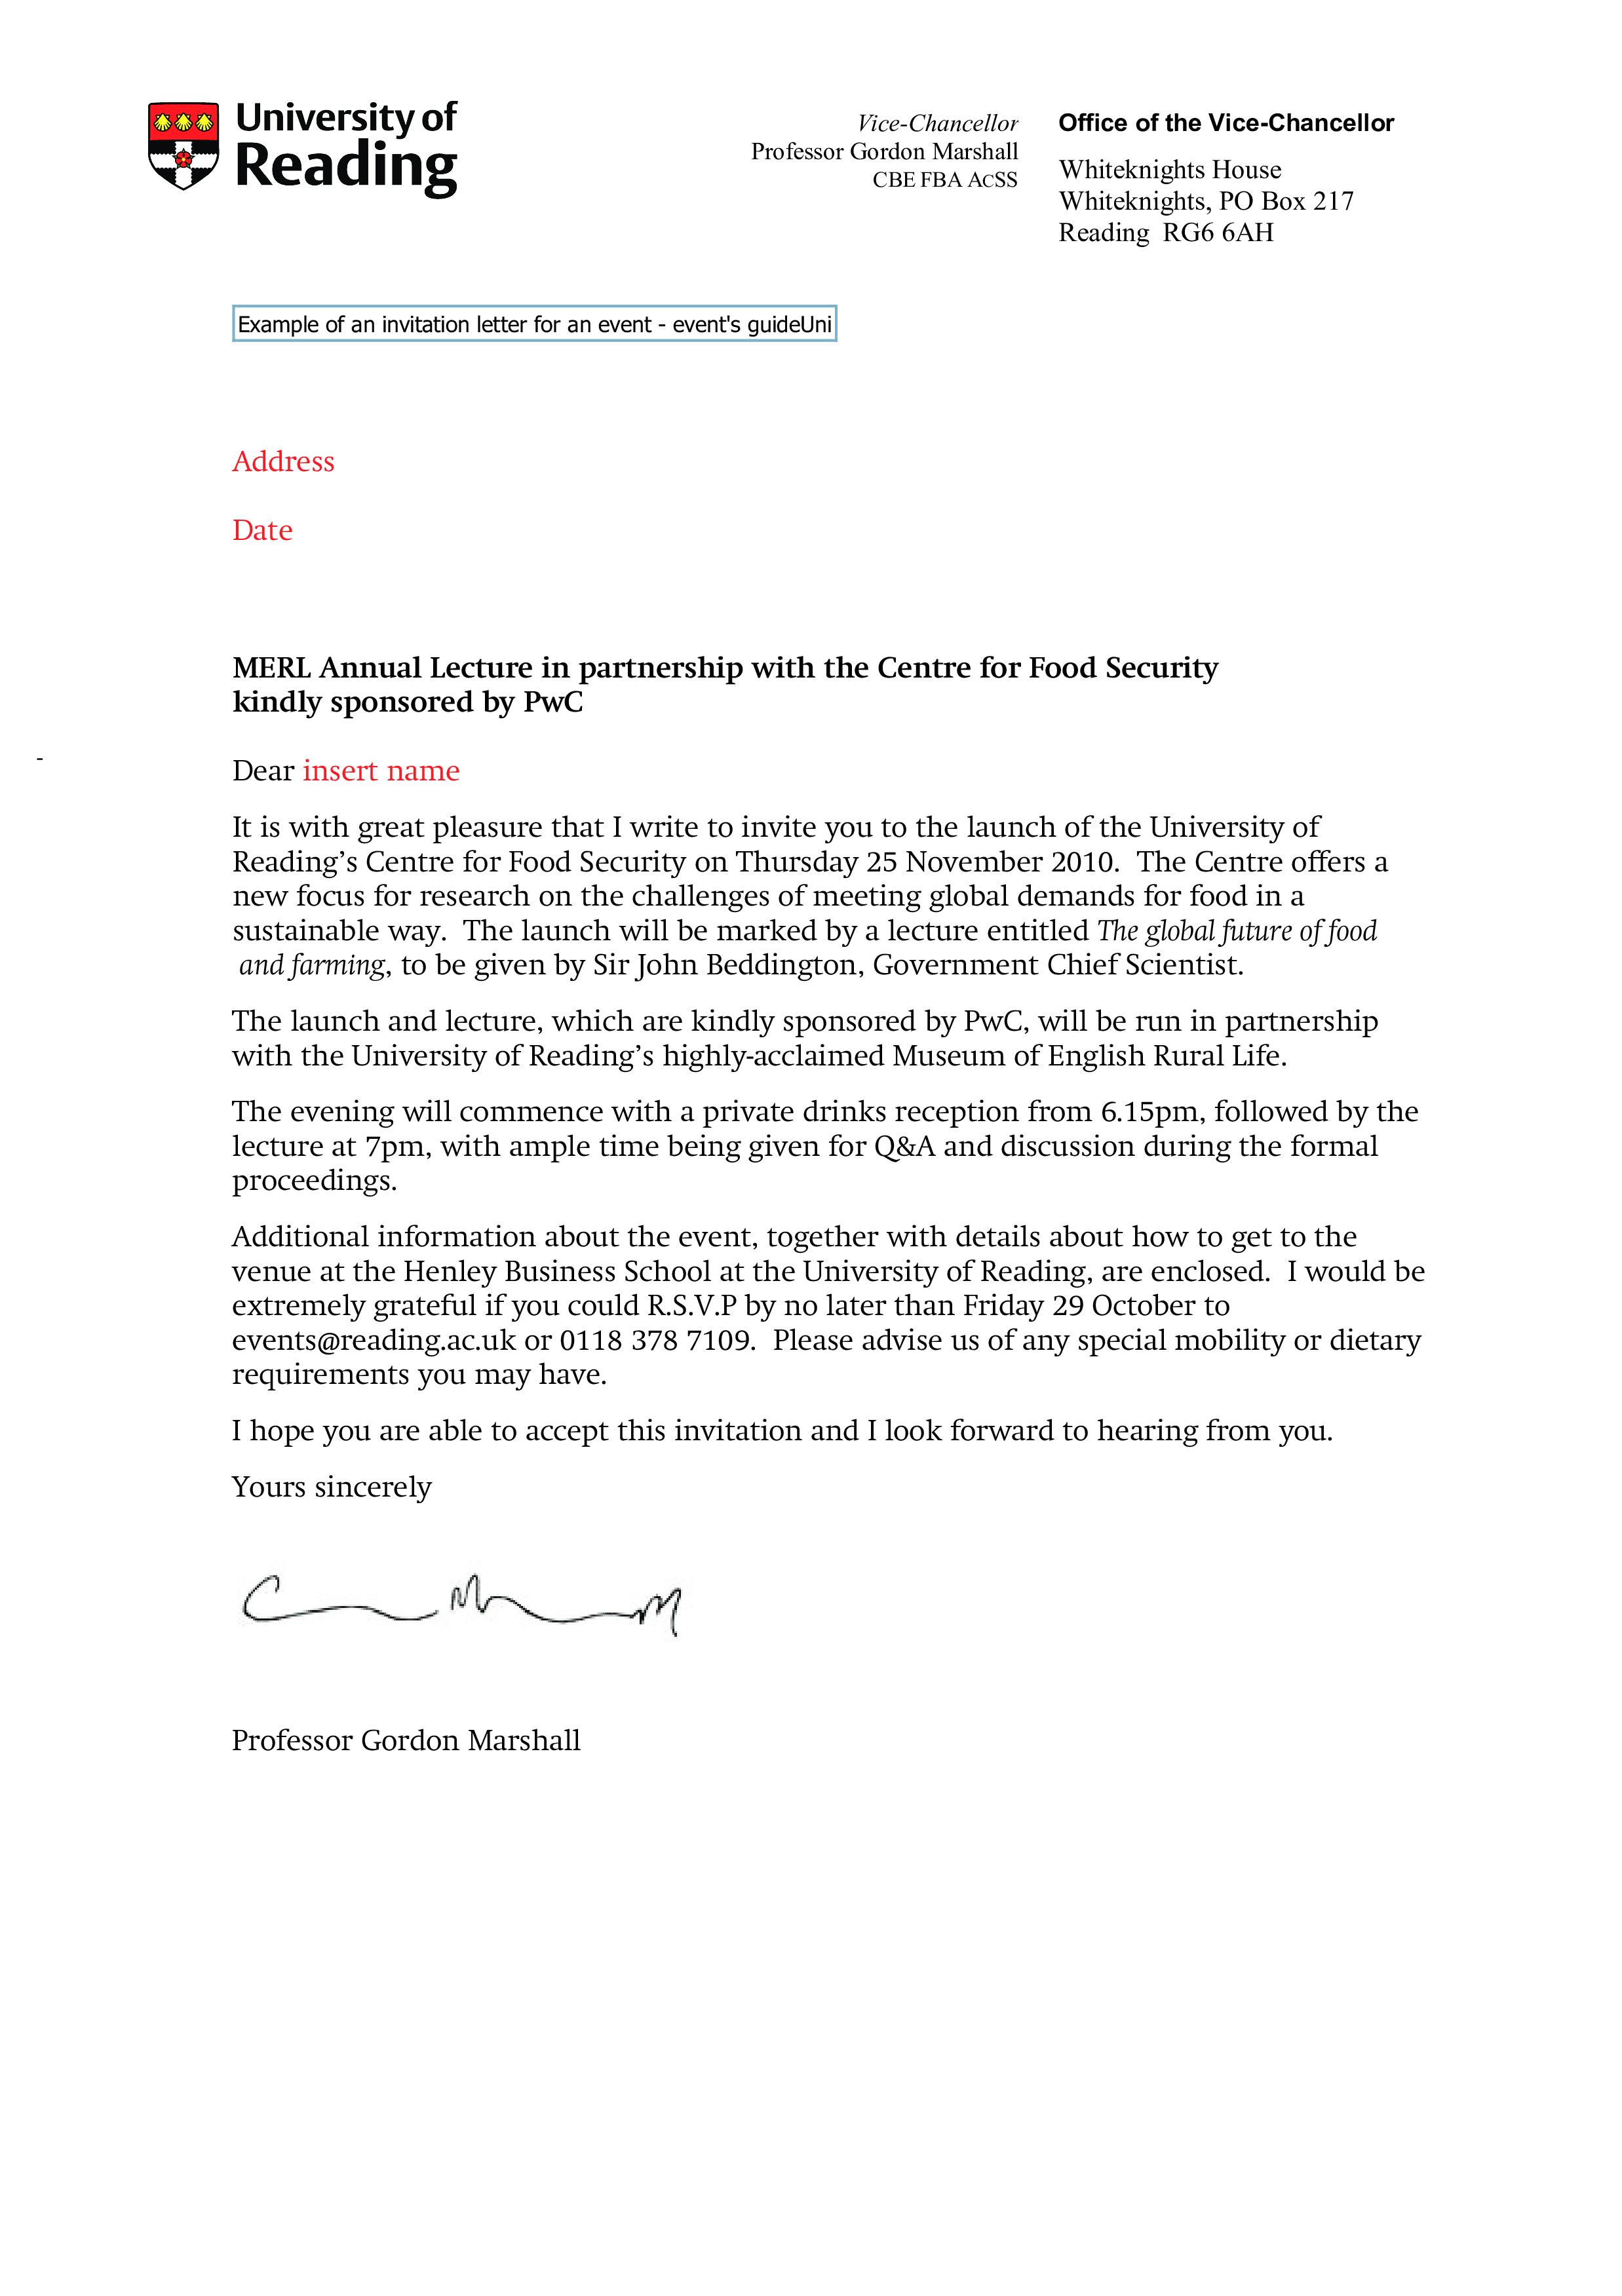 formal invitation letter sample for an